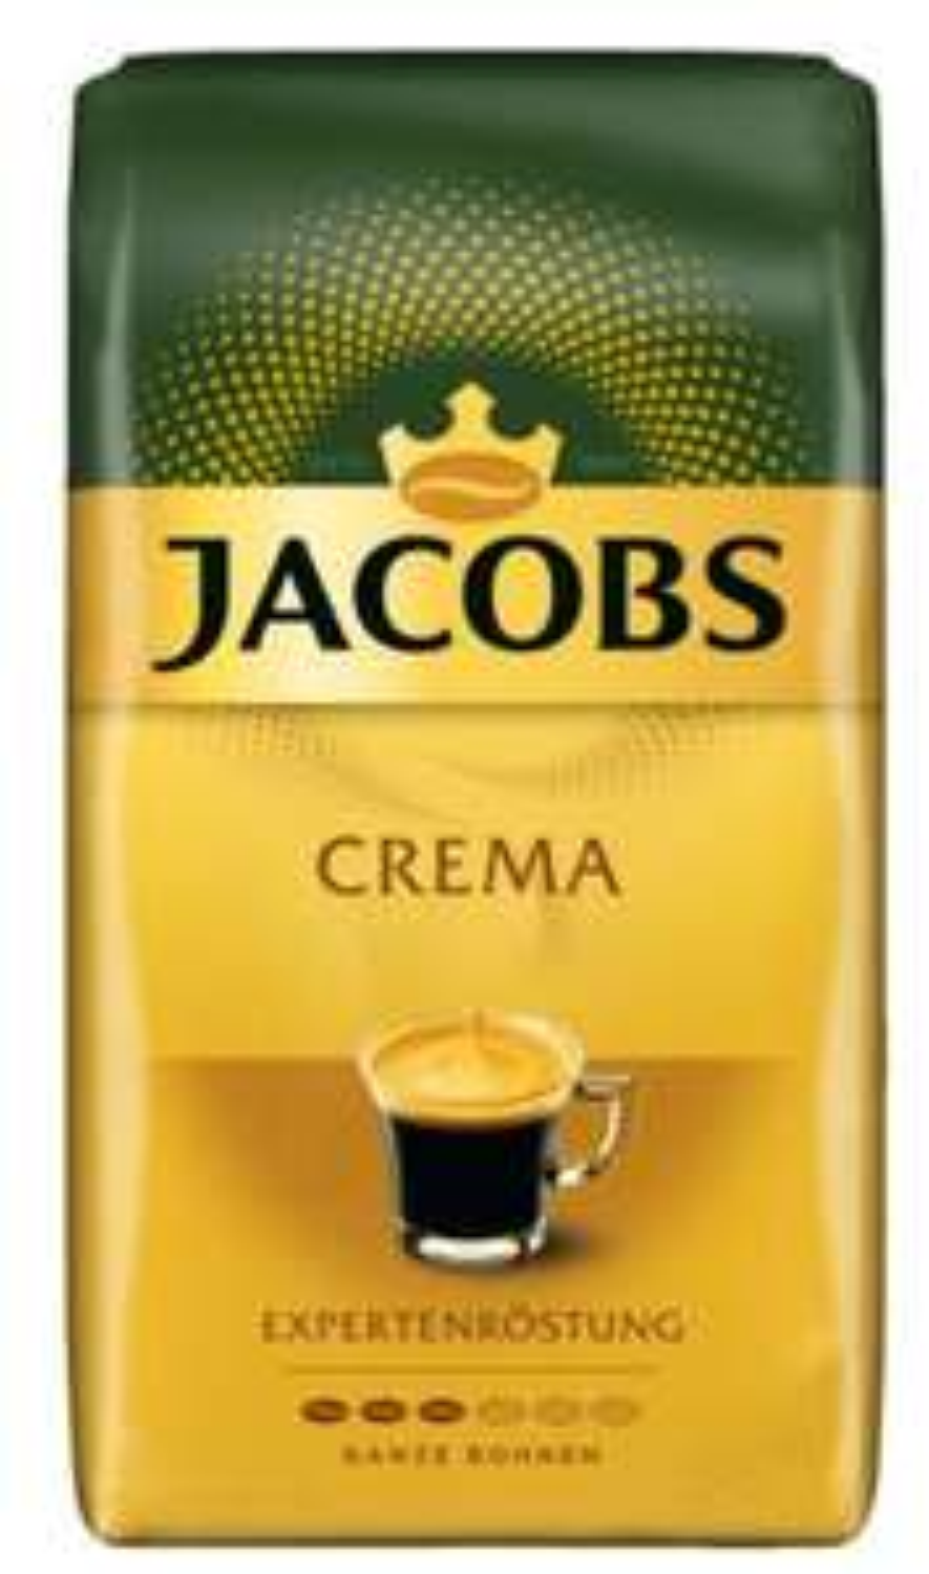 [real offline] Jacobs crema 1000g Ganze Bohne